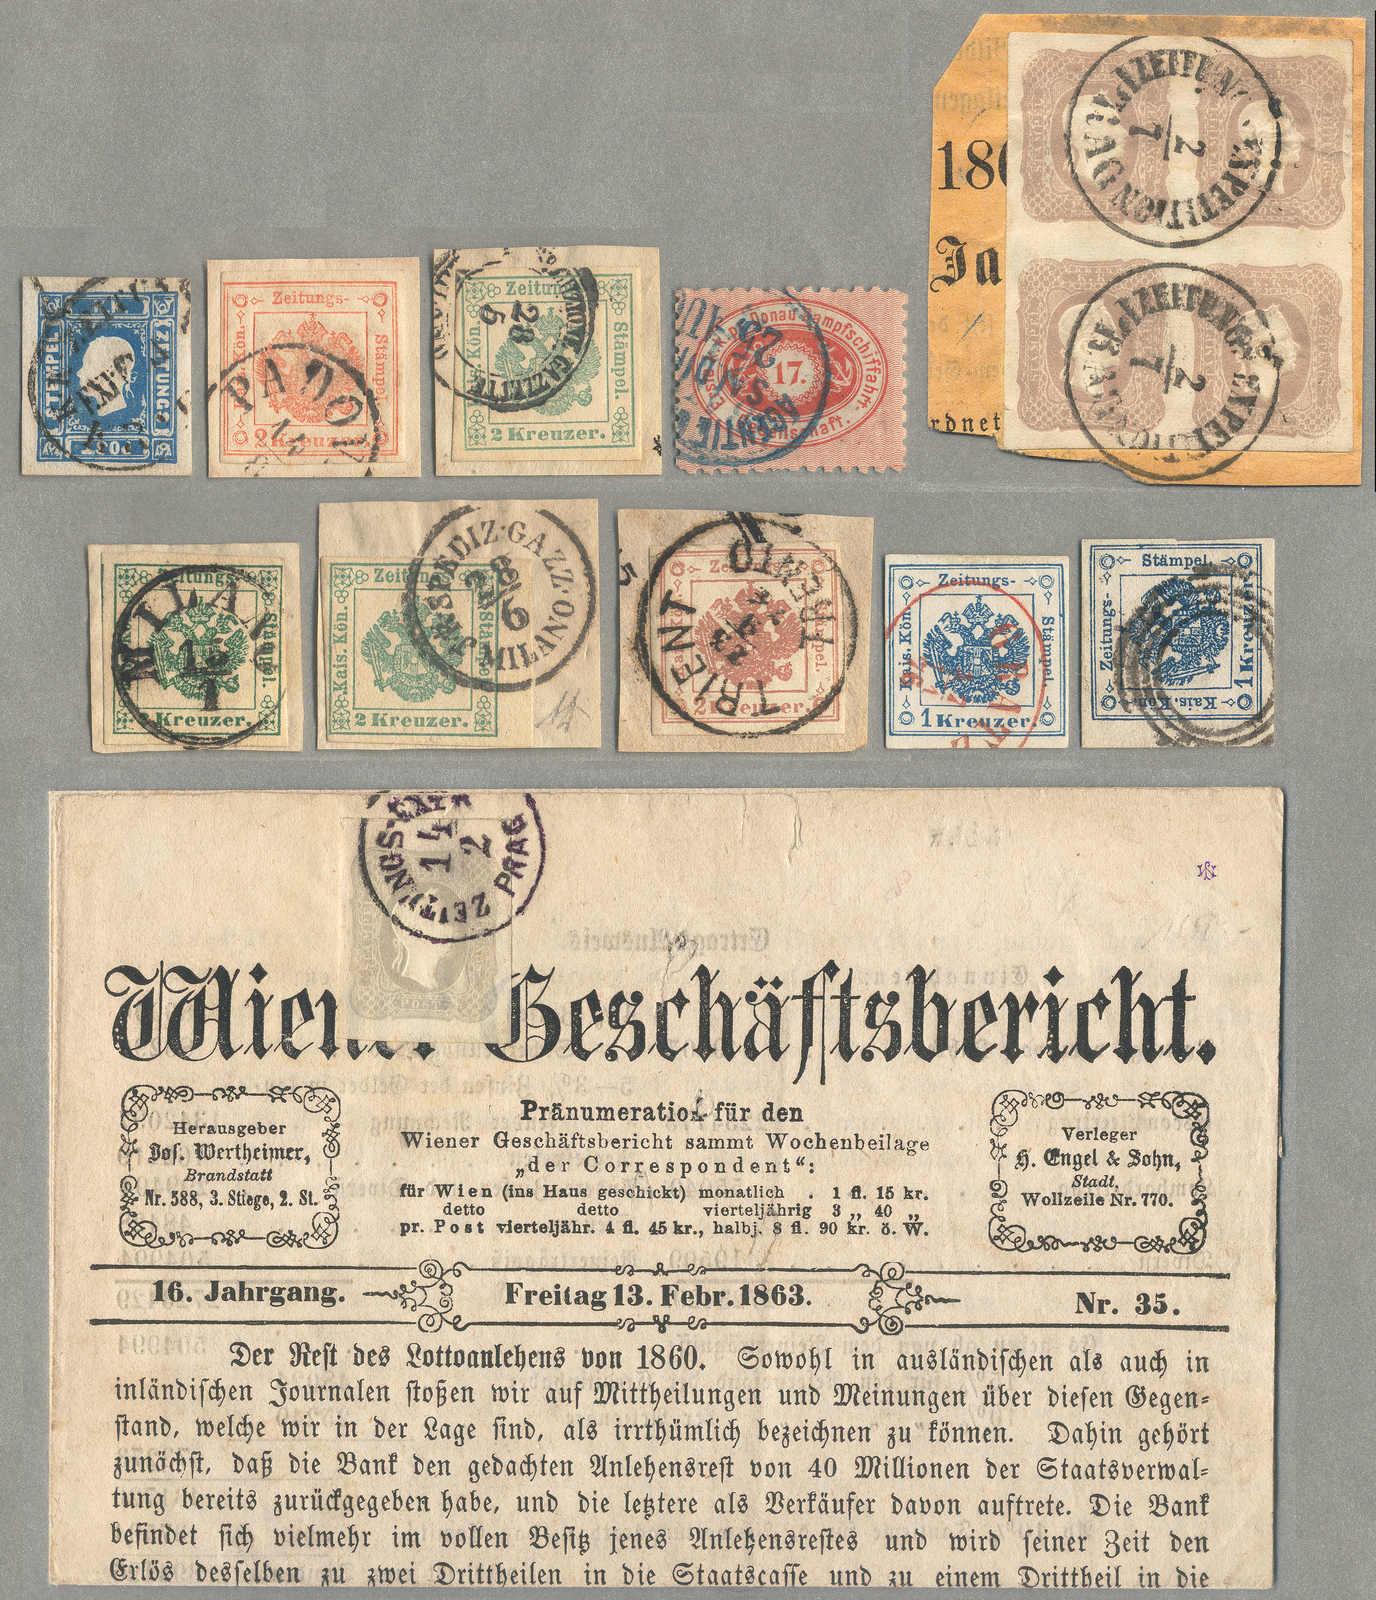 Lot 40326 - europa österreich -  classicphil GmbH 6'th classicphil Auction - Day 3